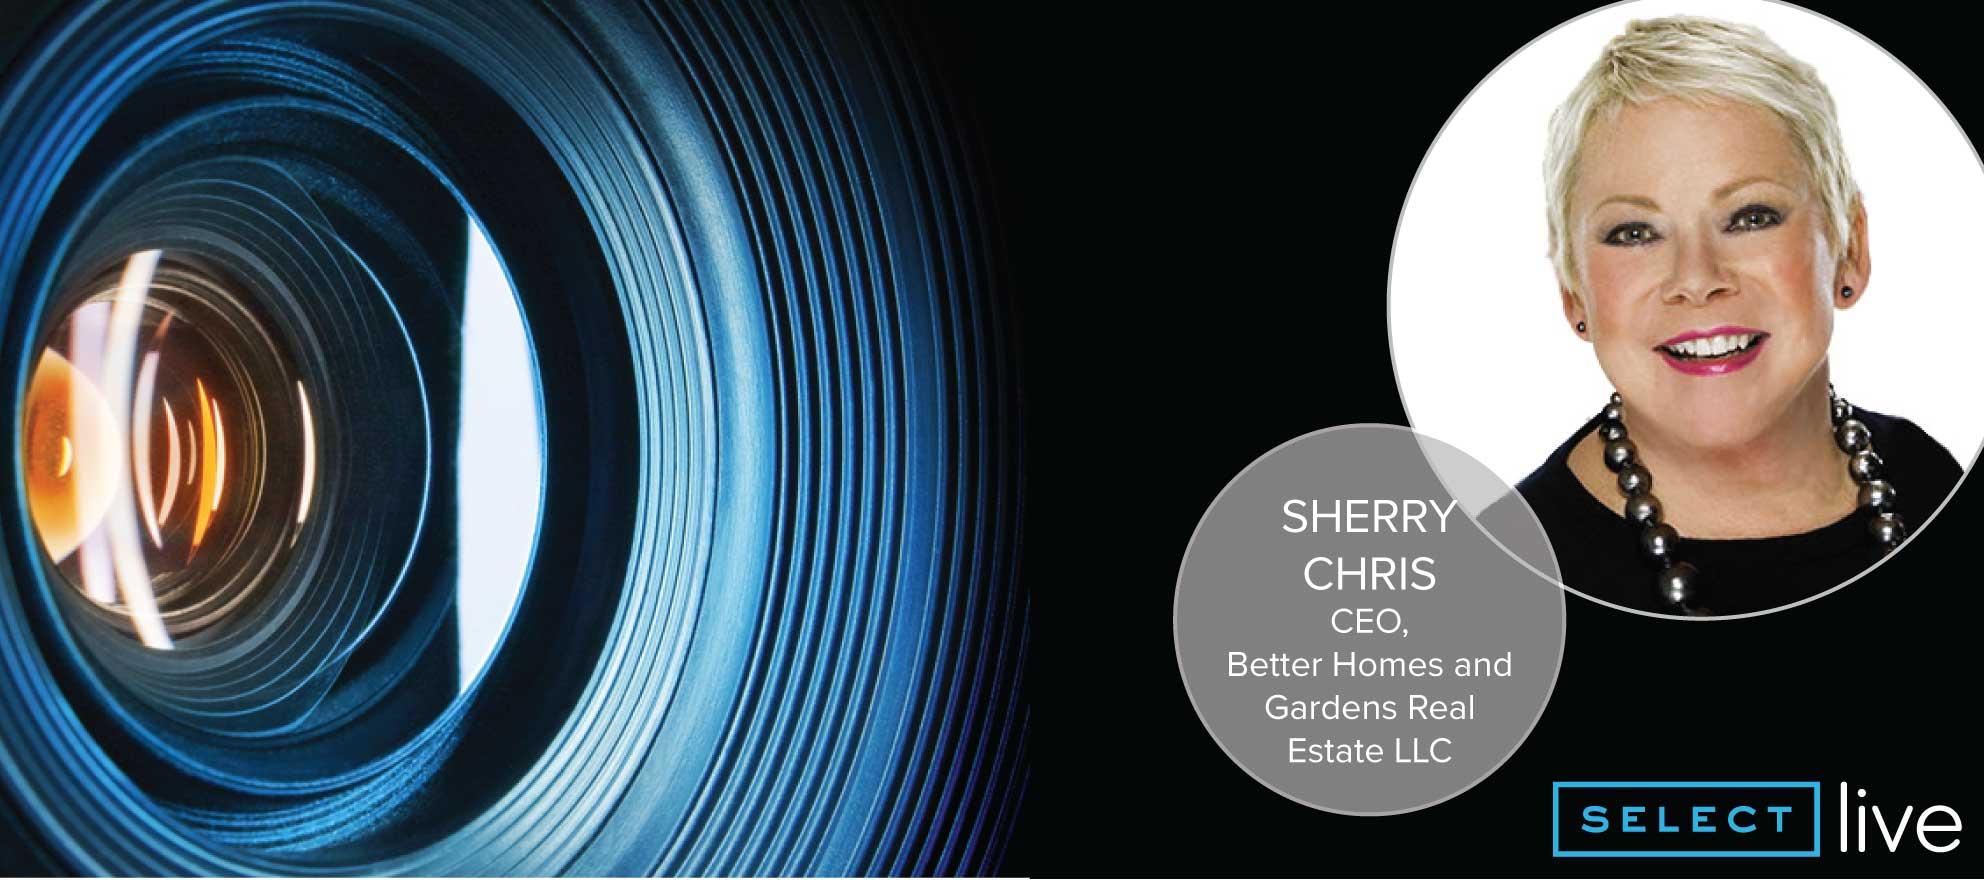 Sherry Chris: 'Be a servant-leader'